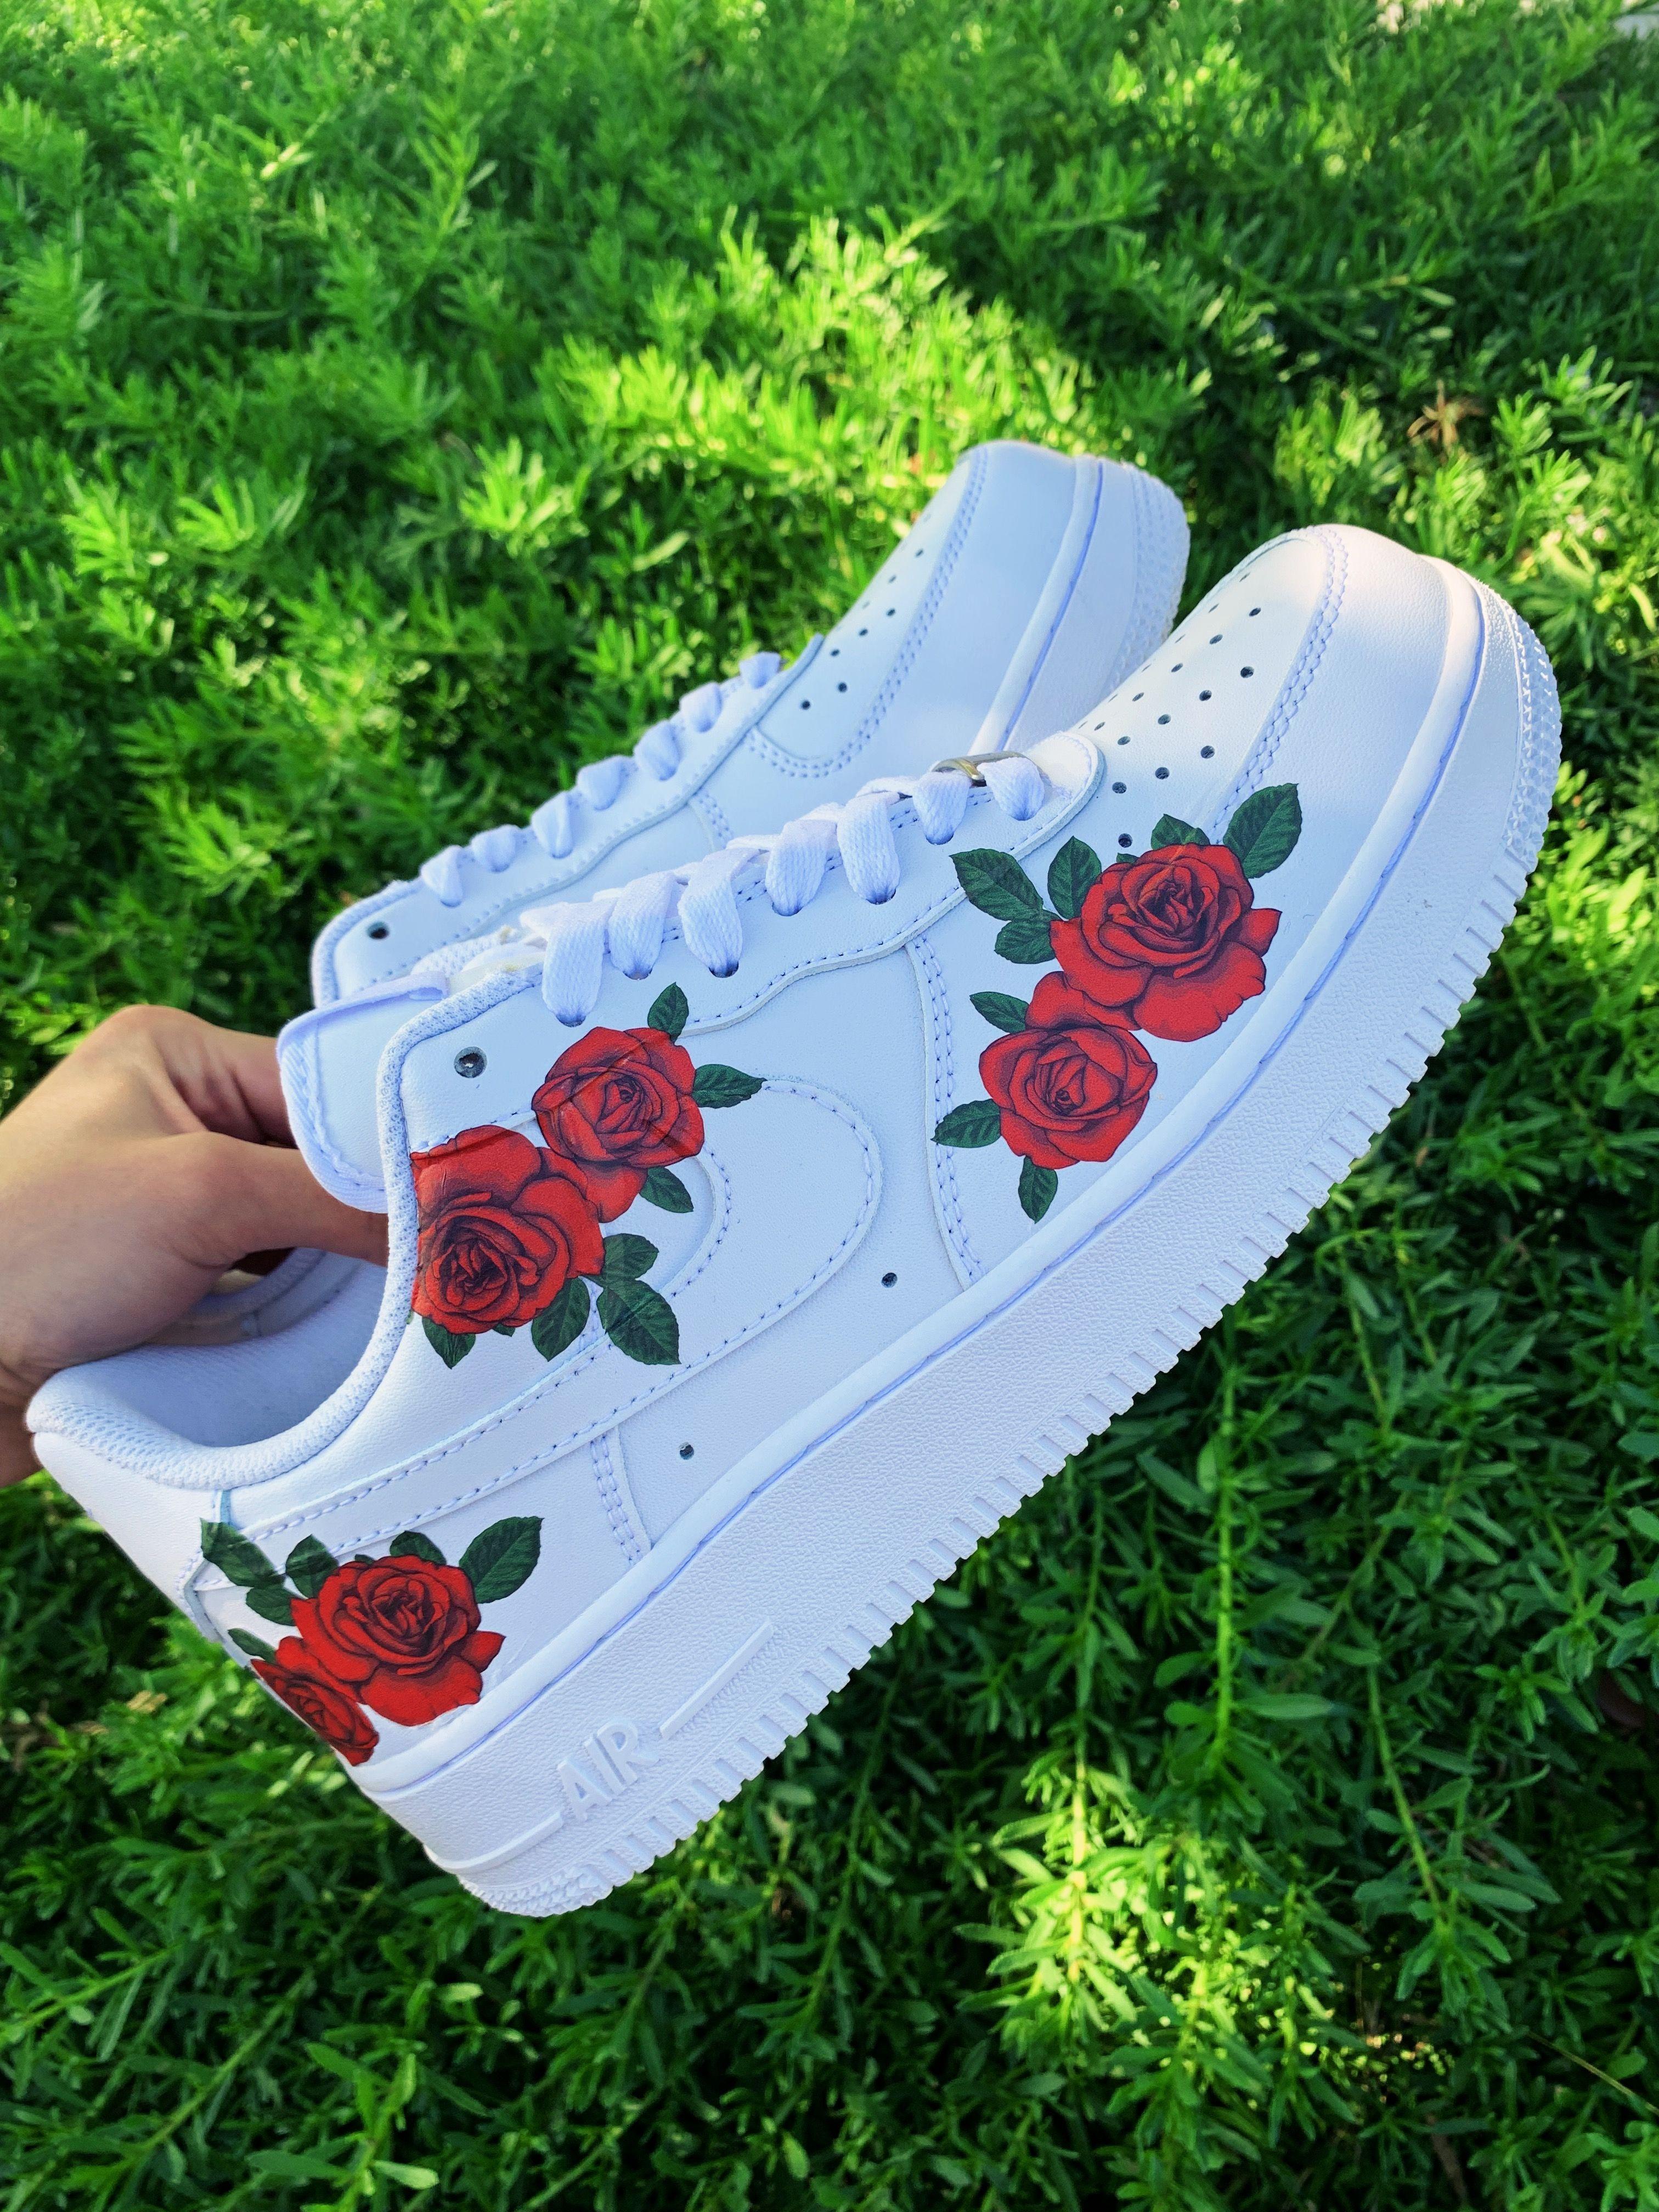 Custom Nike Shoes, Rose Nikes, Rose